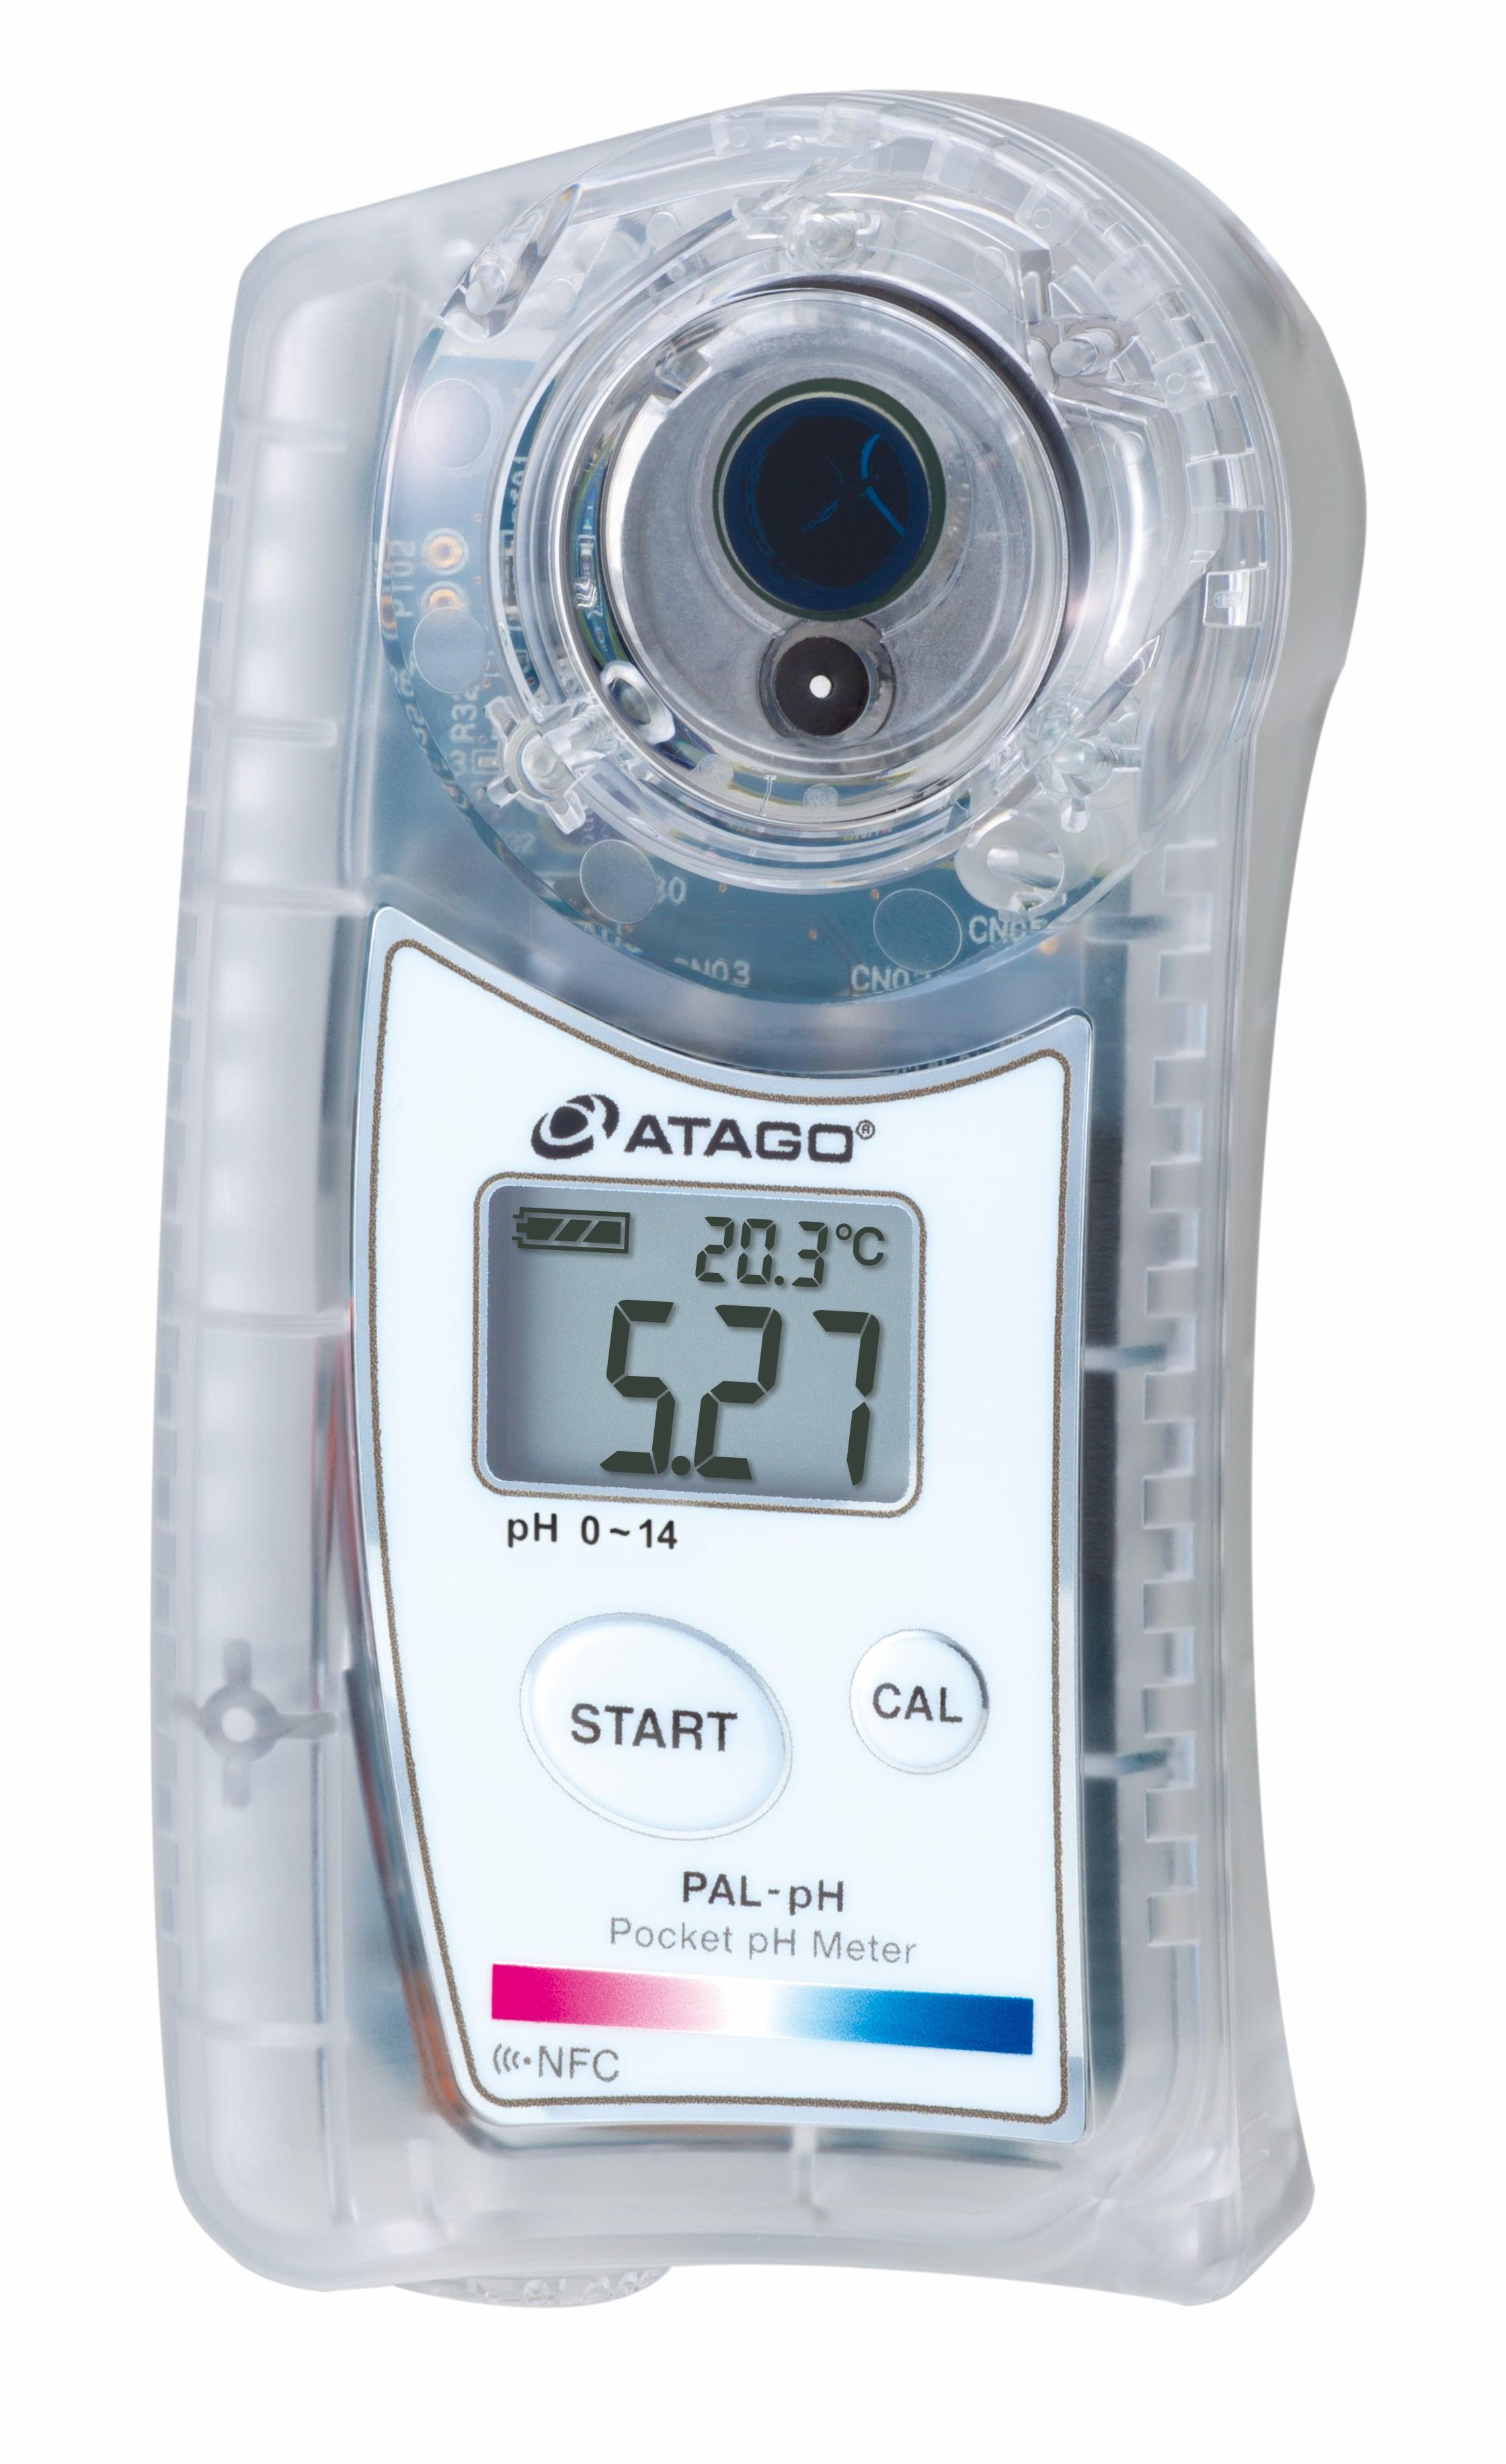 Цифровой рН-метр PAL-pH